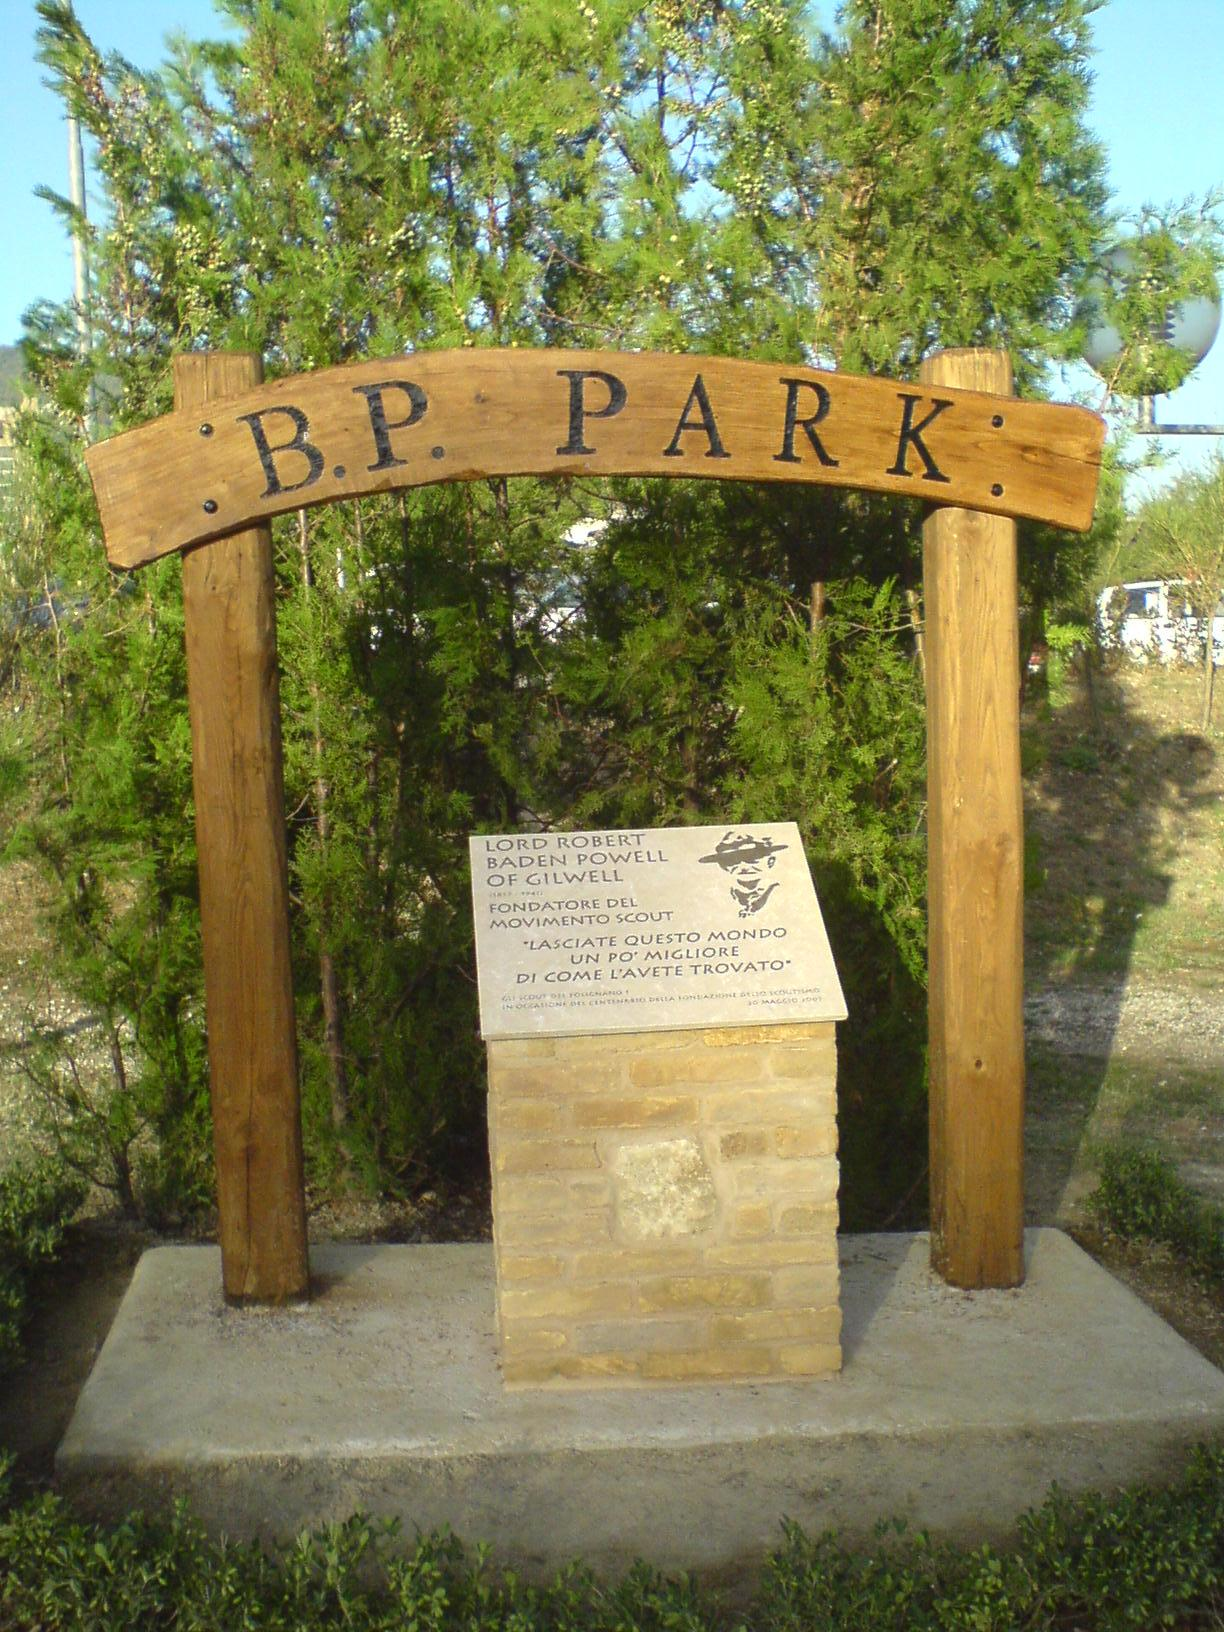 BP PARK 1